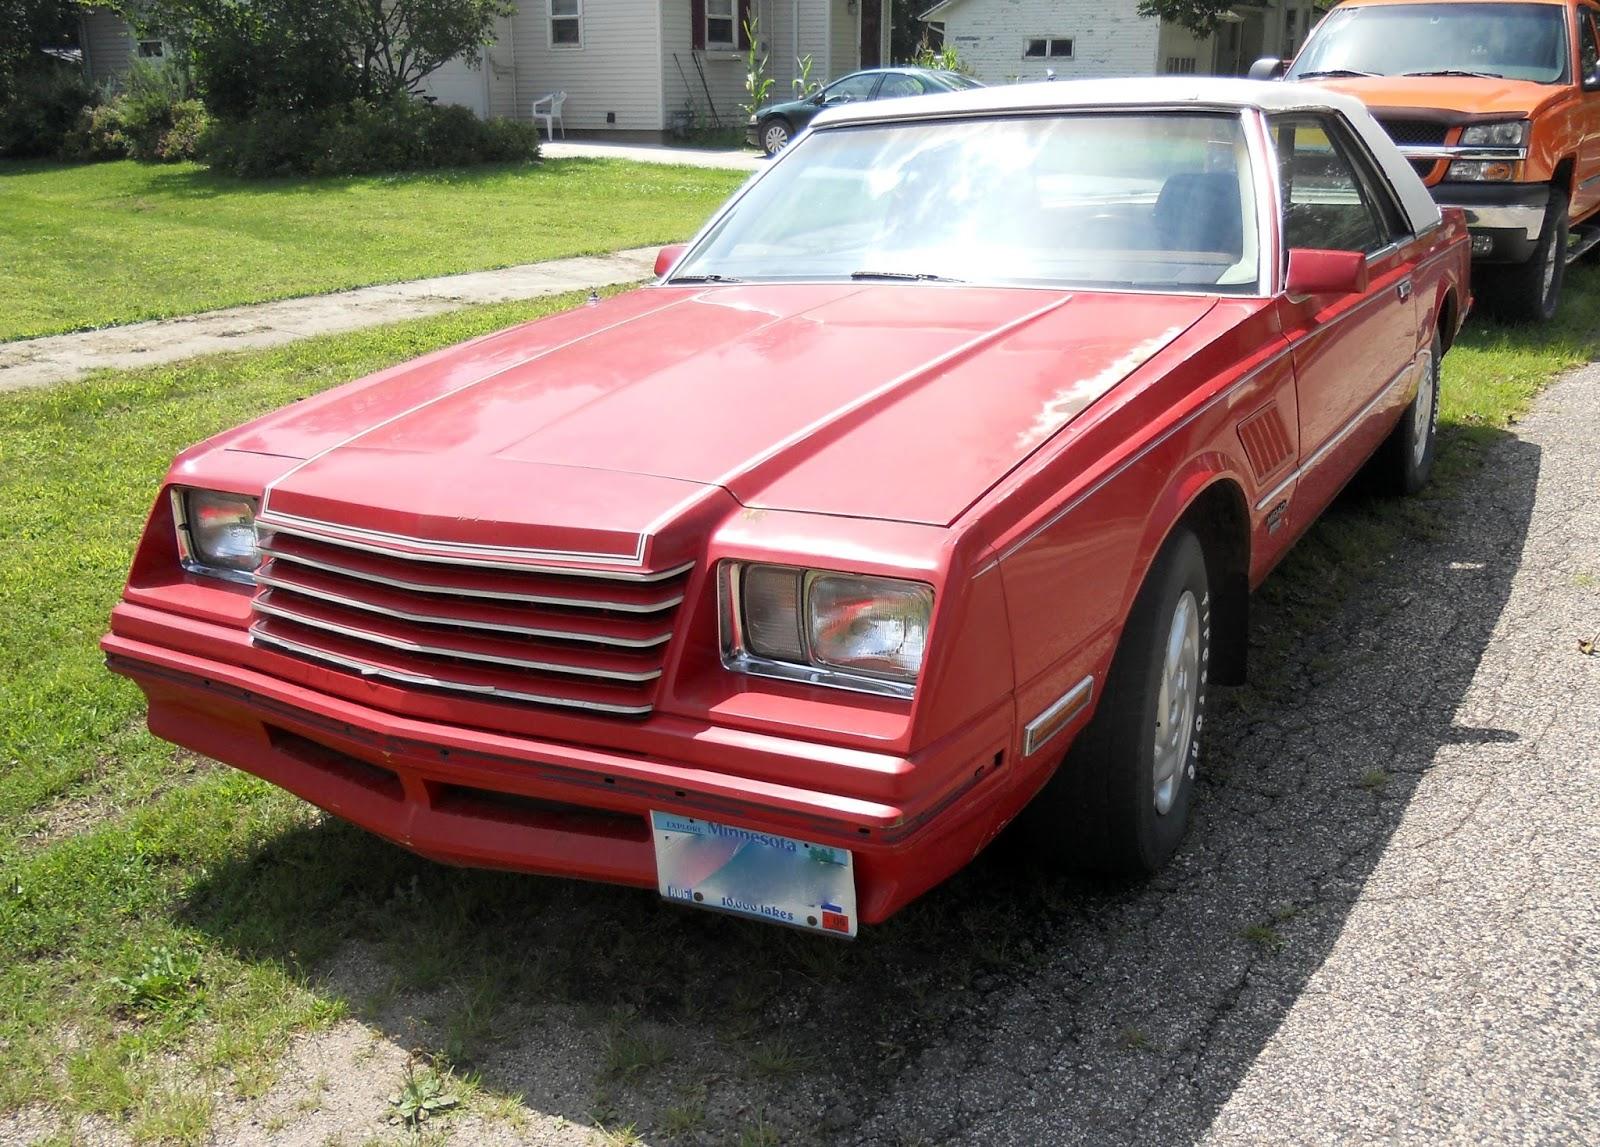 AutomoZeal: The Obscure Dodge Mirada